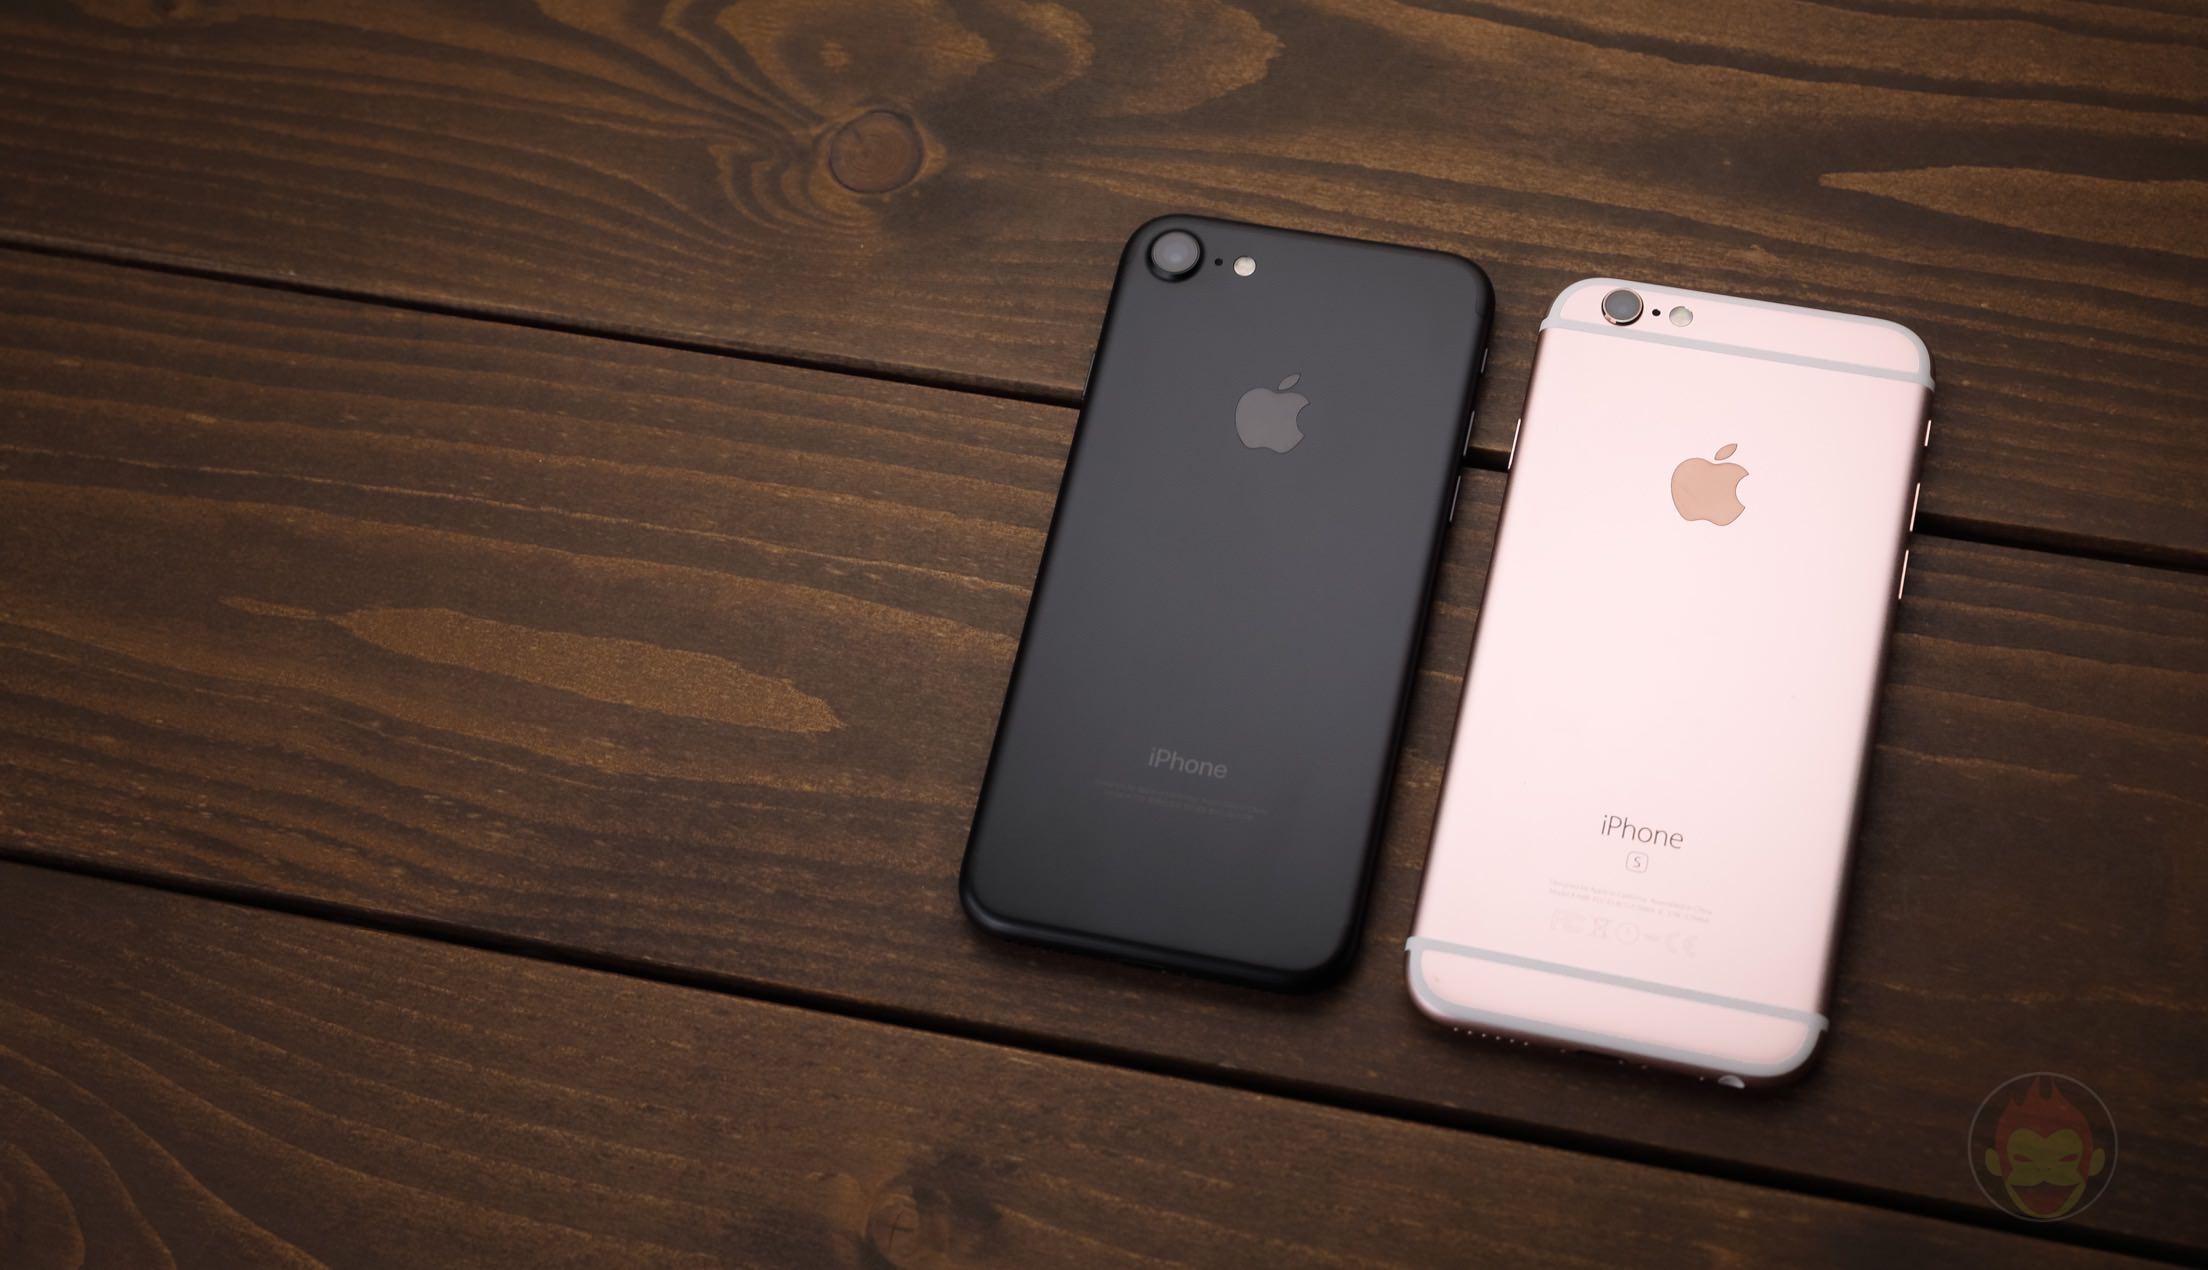 iPhone7-iPhone6s-Comparison-03.jpg